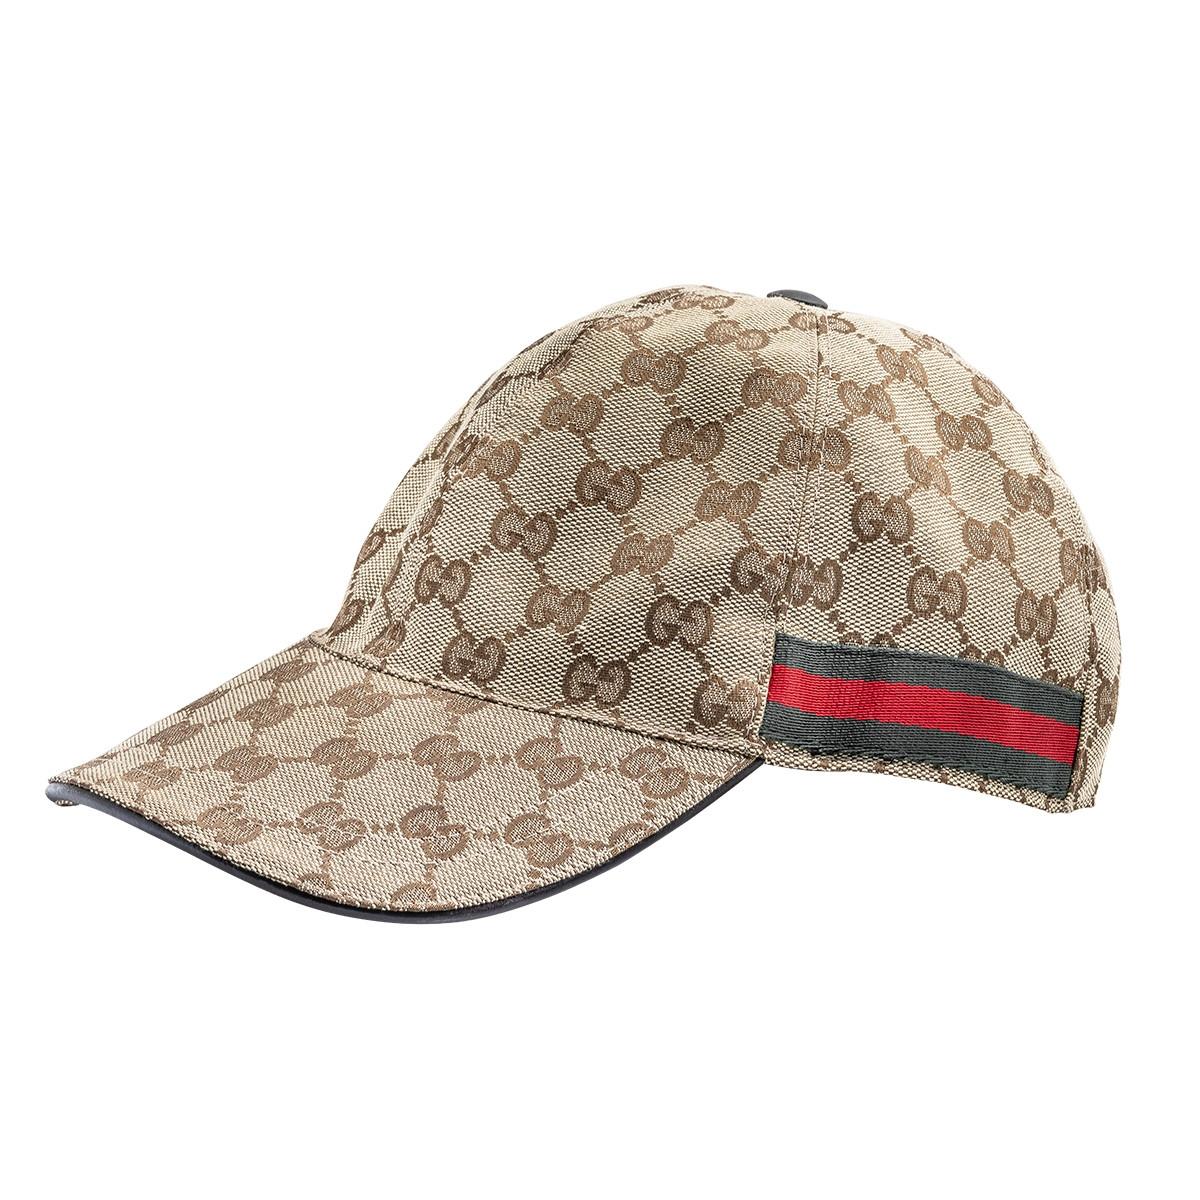 Vintage Gucci Monogram Baseball Cap